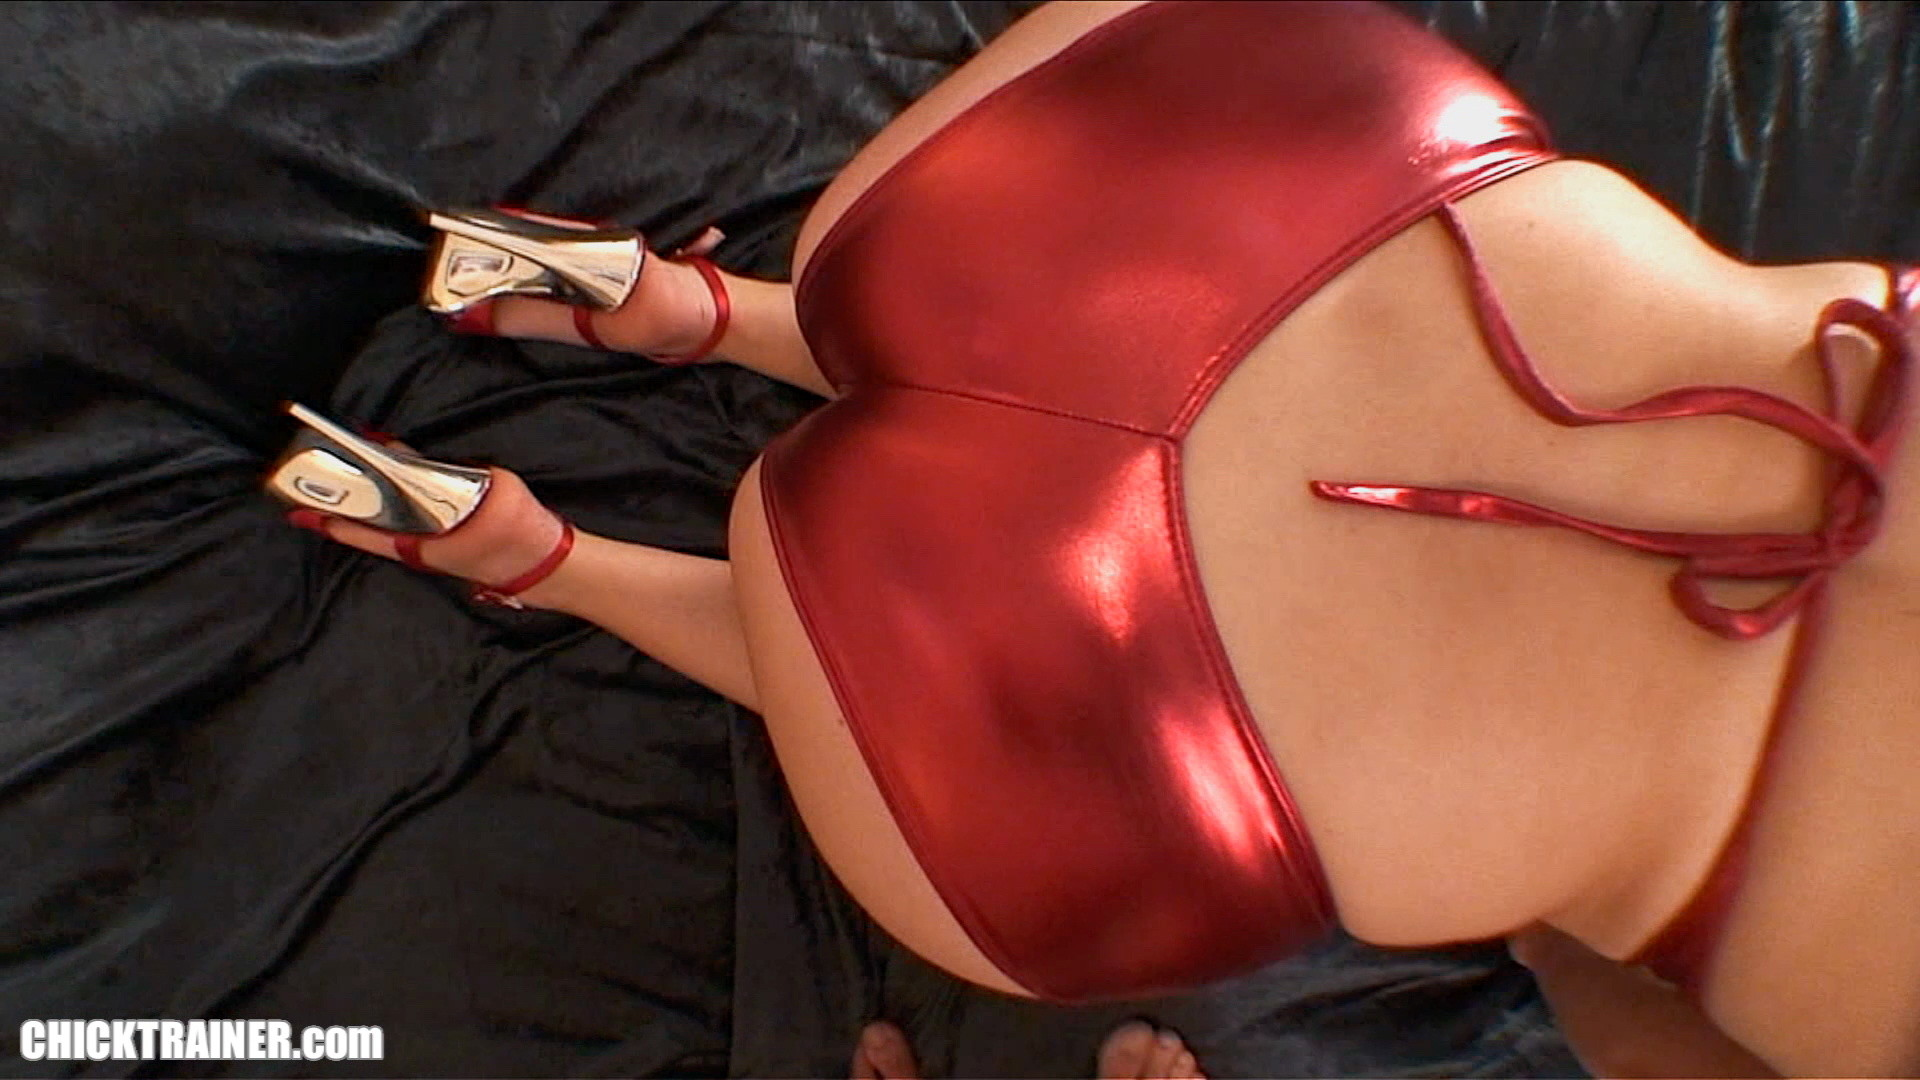 Big boobs amateur girlfriend fucking in red hotpants high heels